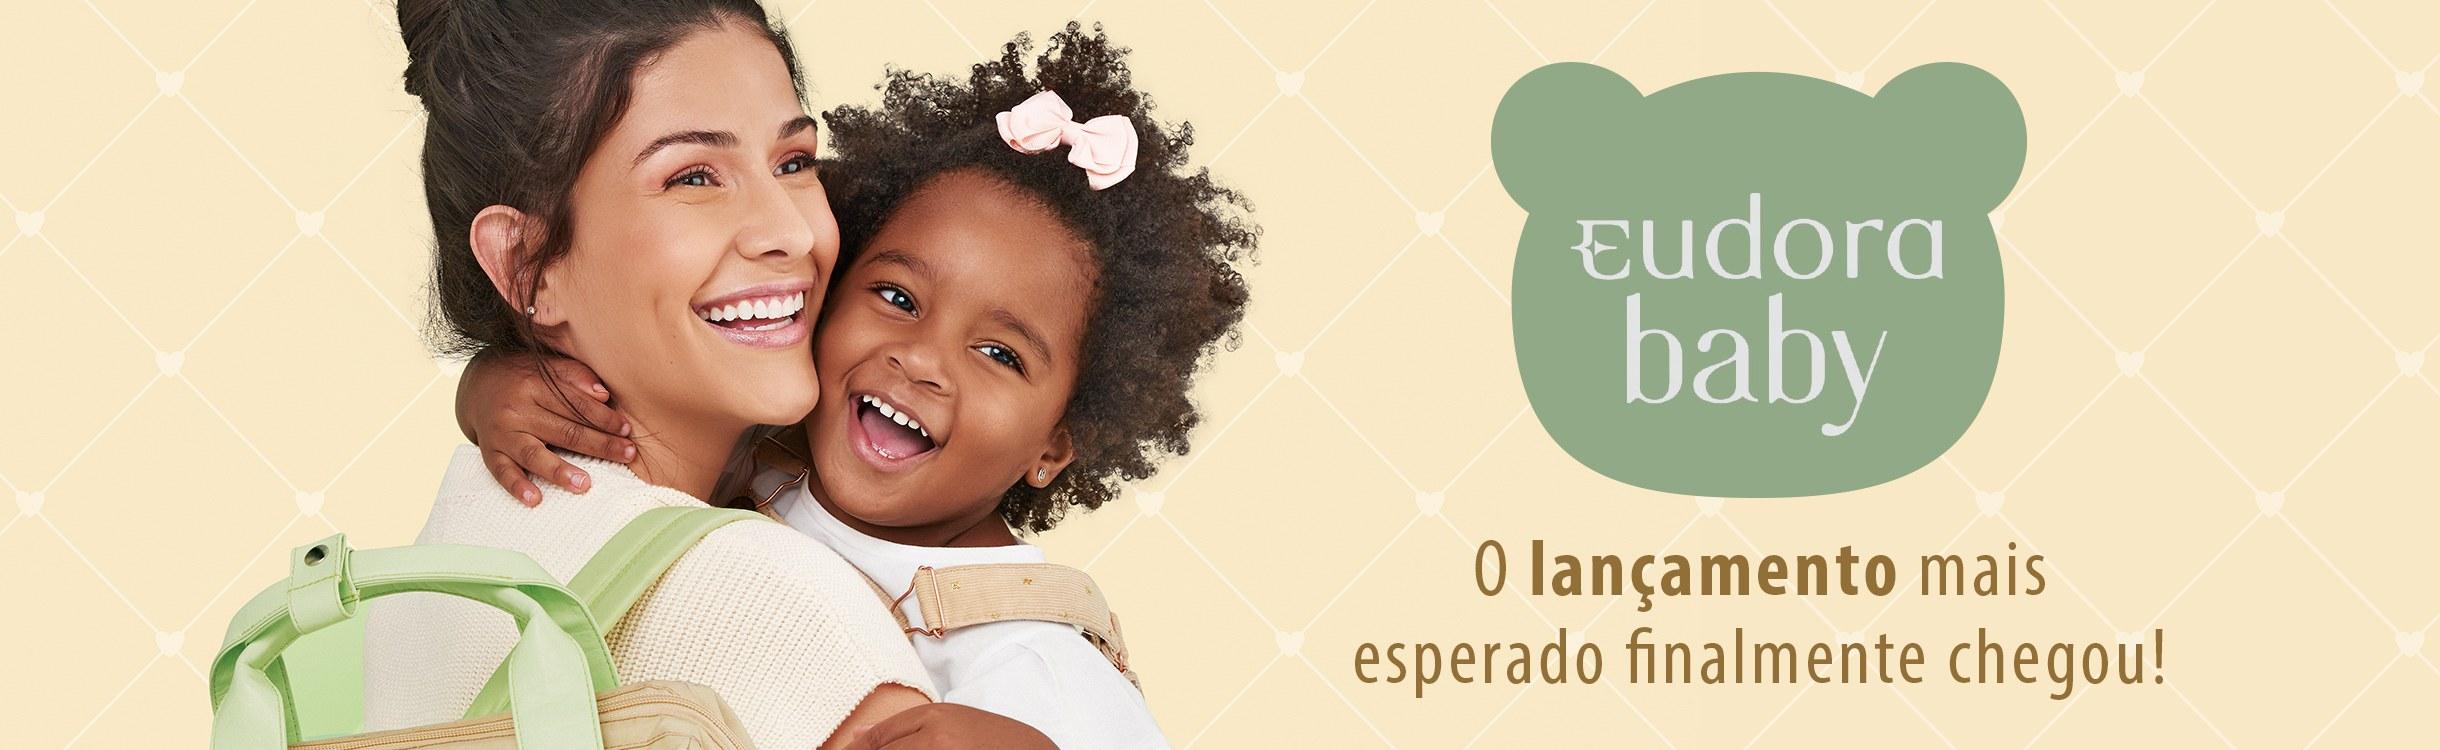 Eudora Baby